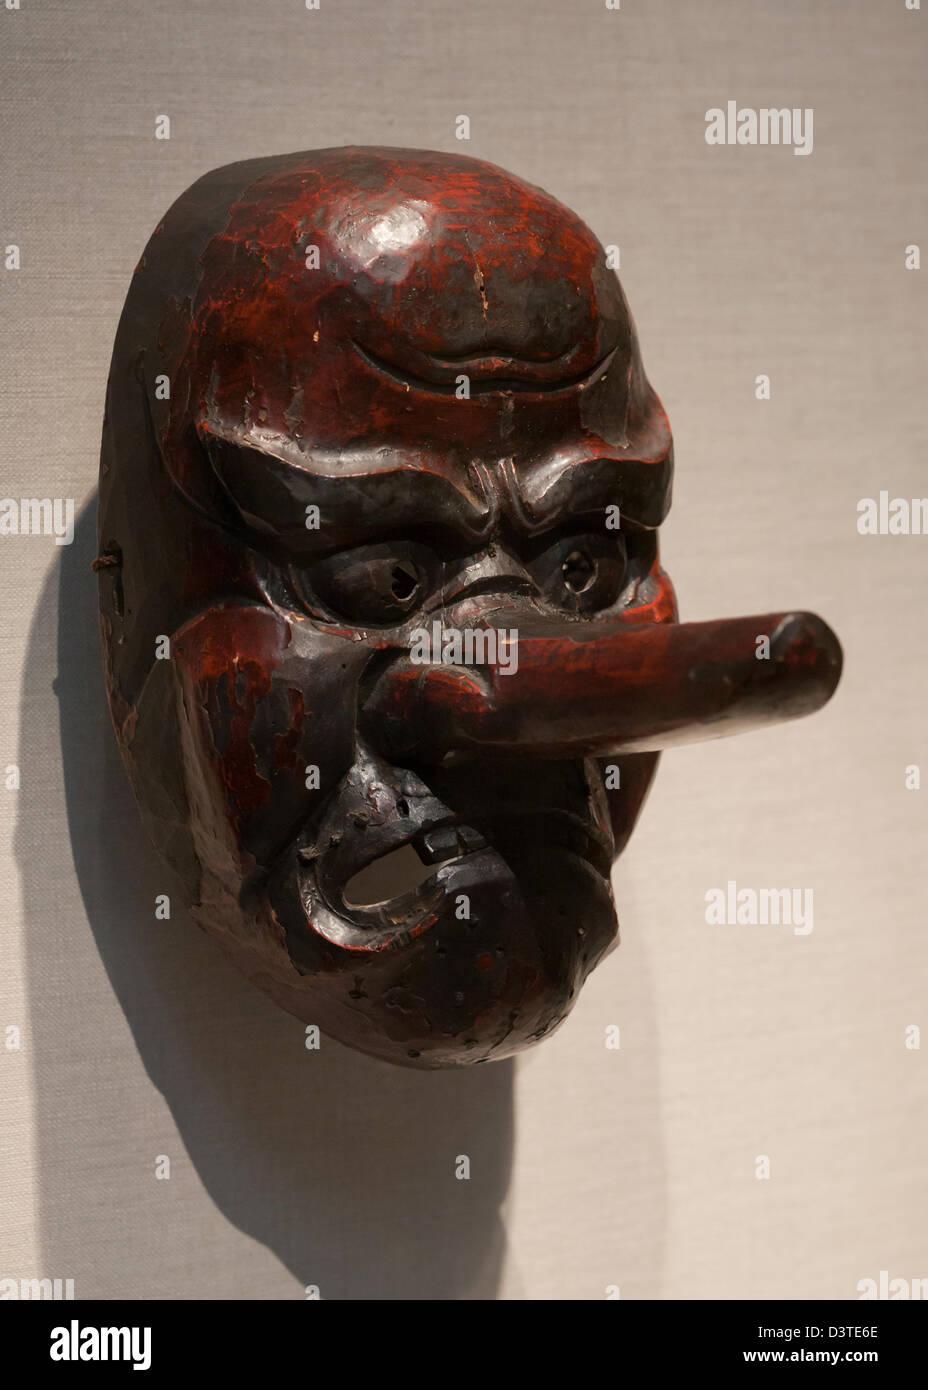 Wooden Japanese shrine demon mask from the Edo period 17th century - Stock Image